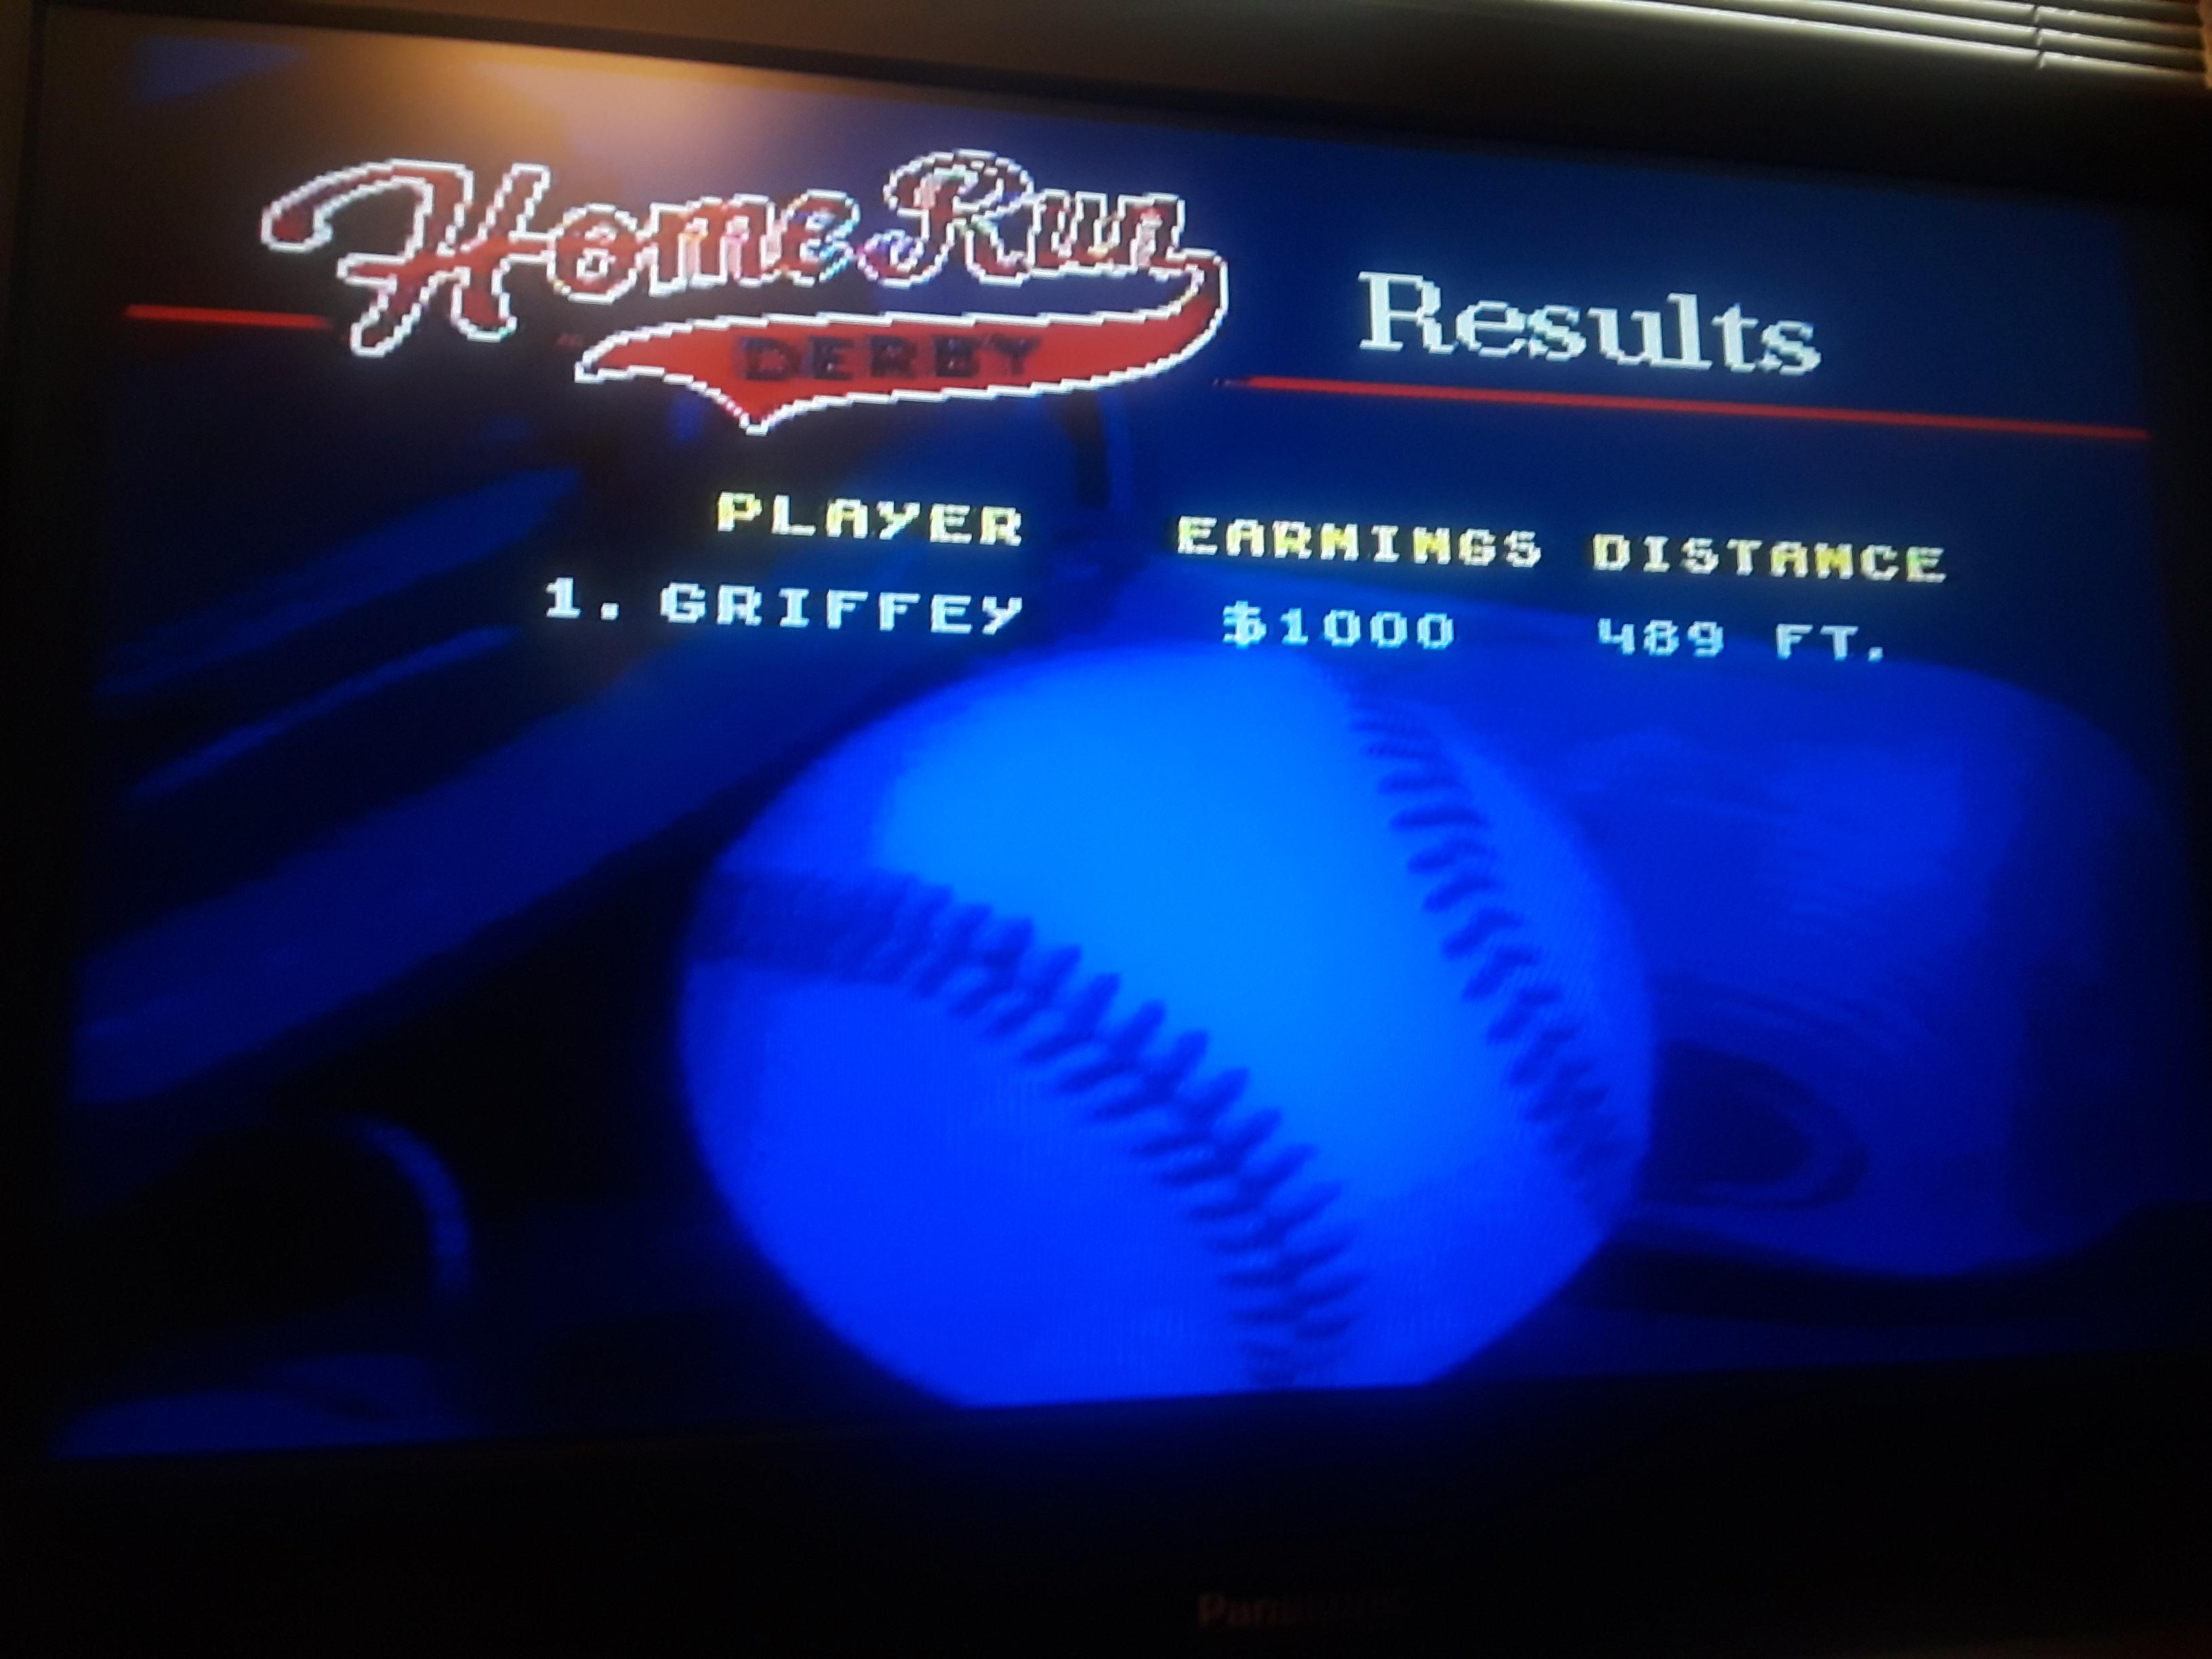 JML101582: World Series Baseball: Home Run Derby [Longest Home Run in Feet] (Sega Genesis / MegaDrive Emulated) 489 points on 2019-07-15 18:18:49